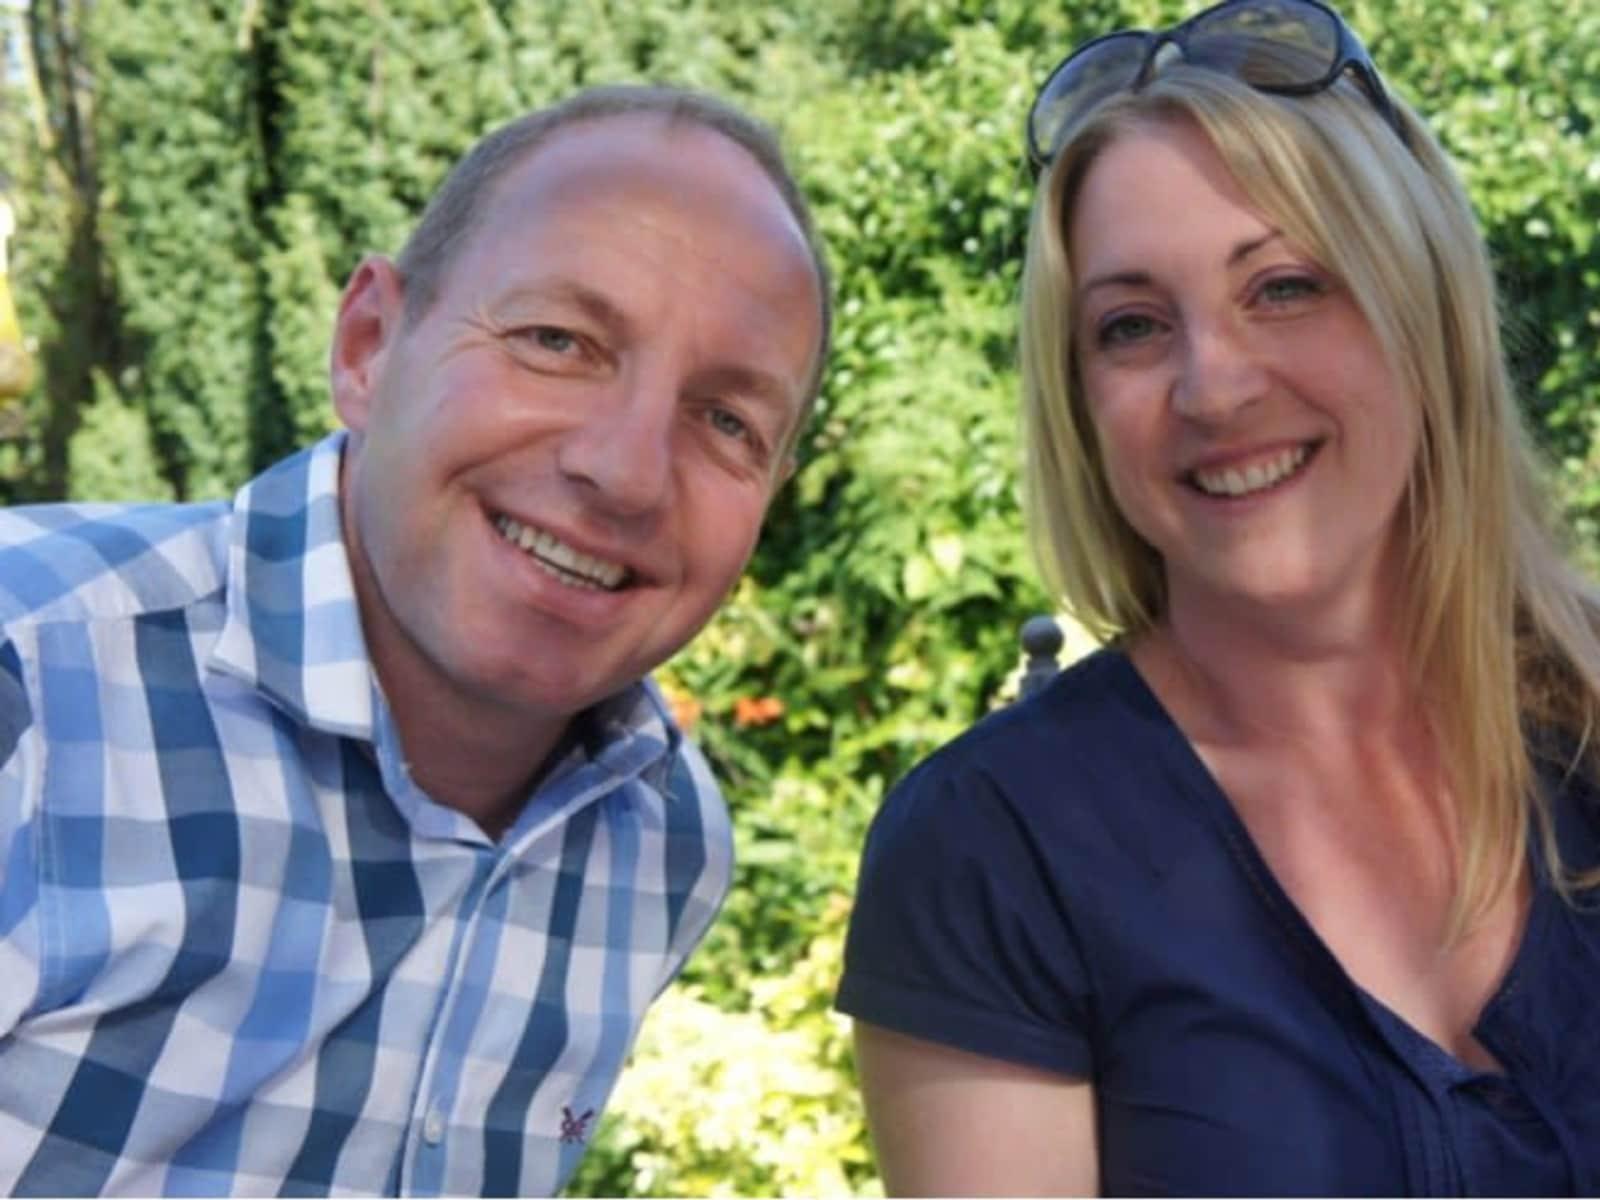 Clair louise & Michael from Glastonbury, United Kingdom